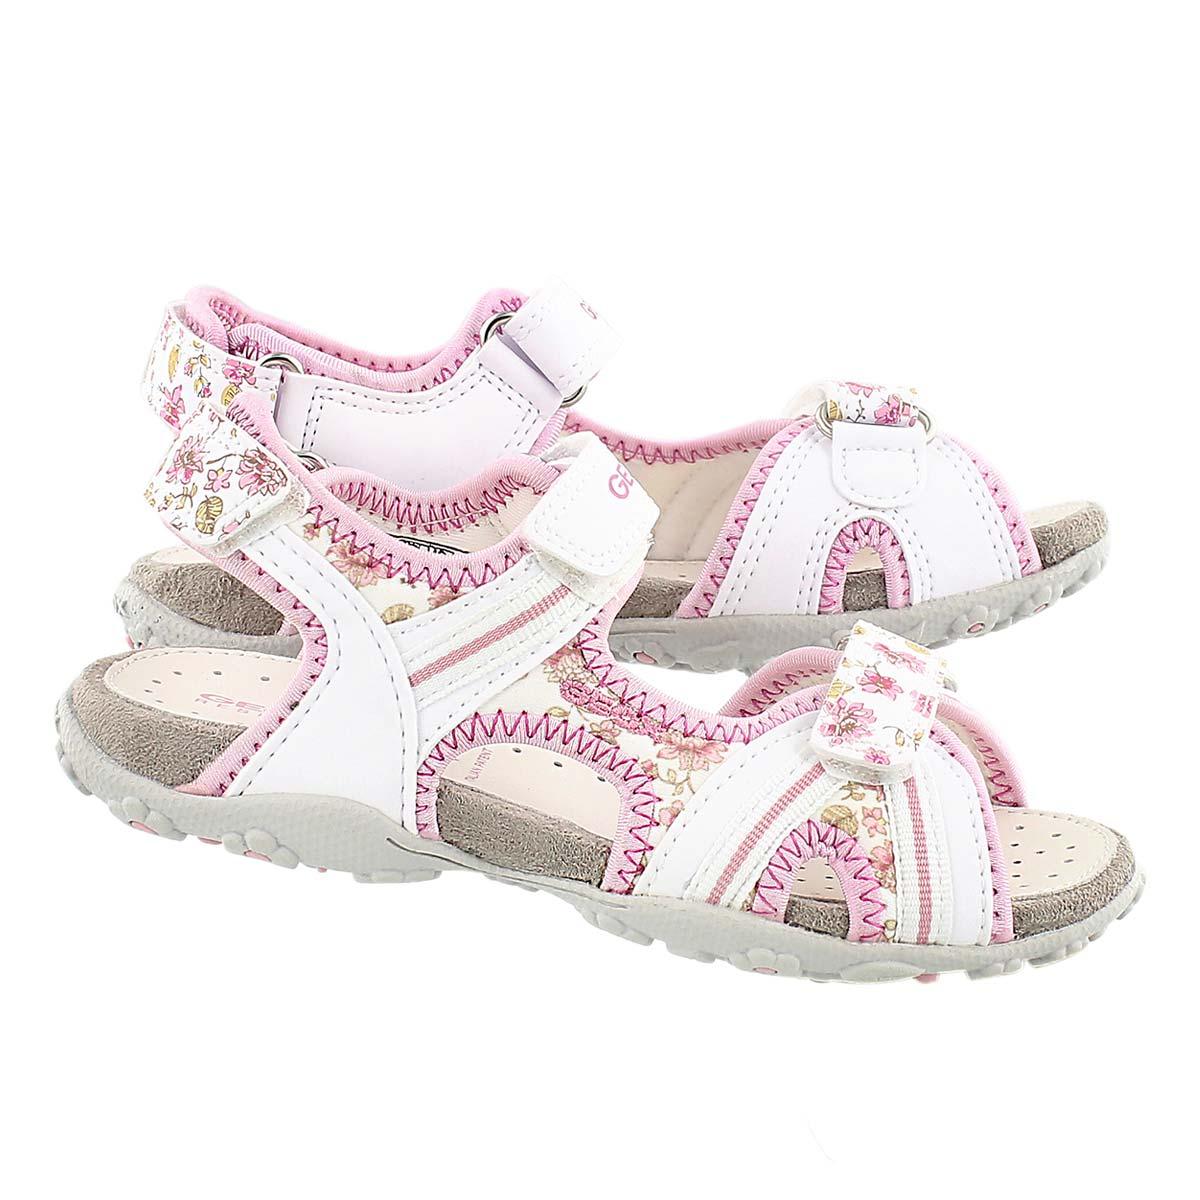 Sandale sport ROXANNE, blanc/rose, fille